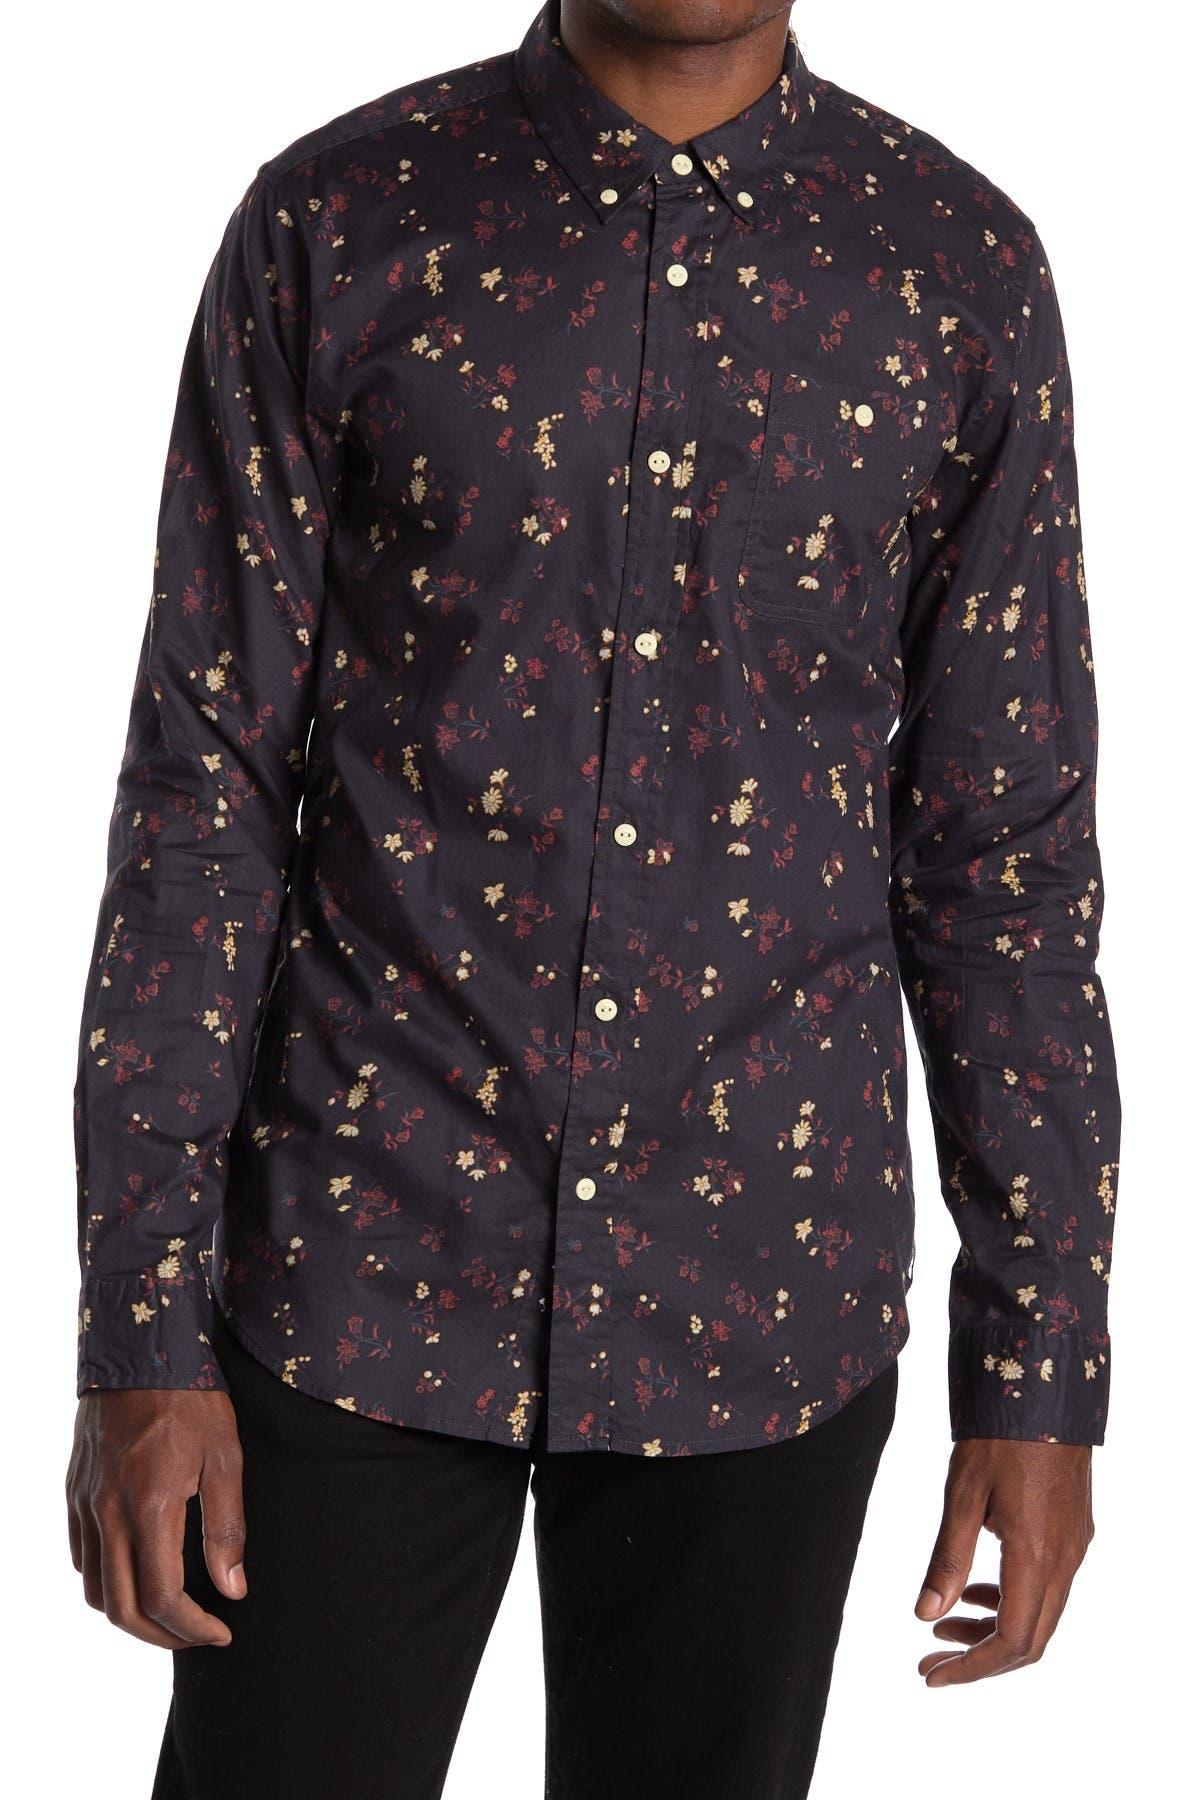 Image of Ezekiel Tahquitz Long Sleeve Woven Shirt